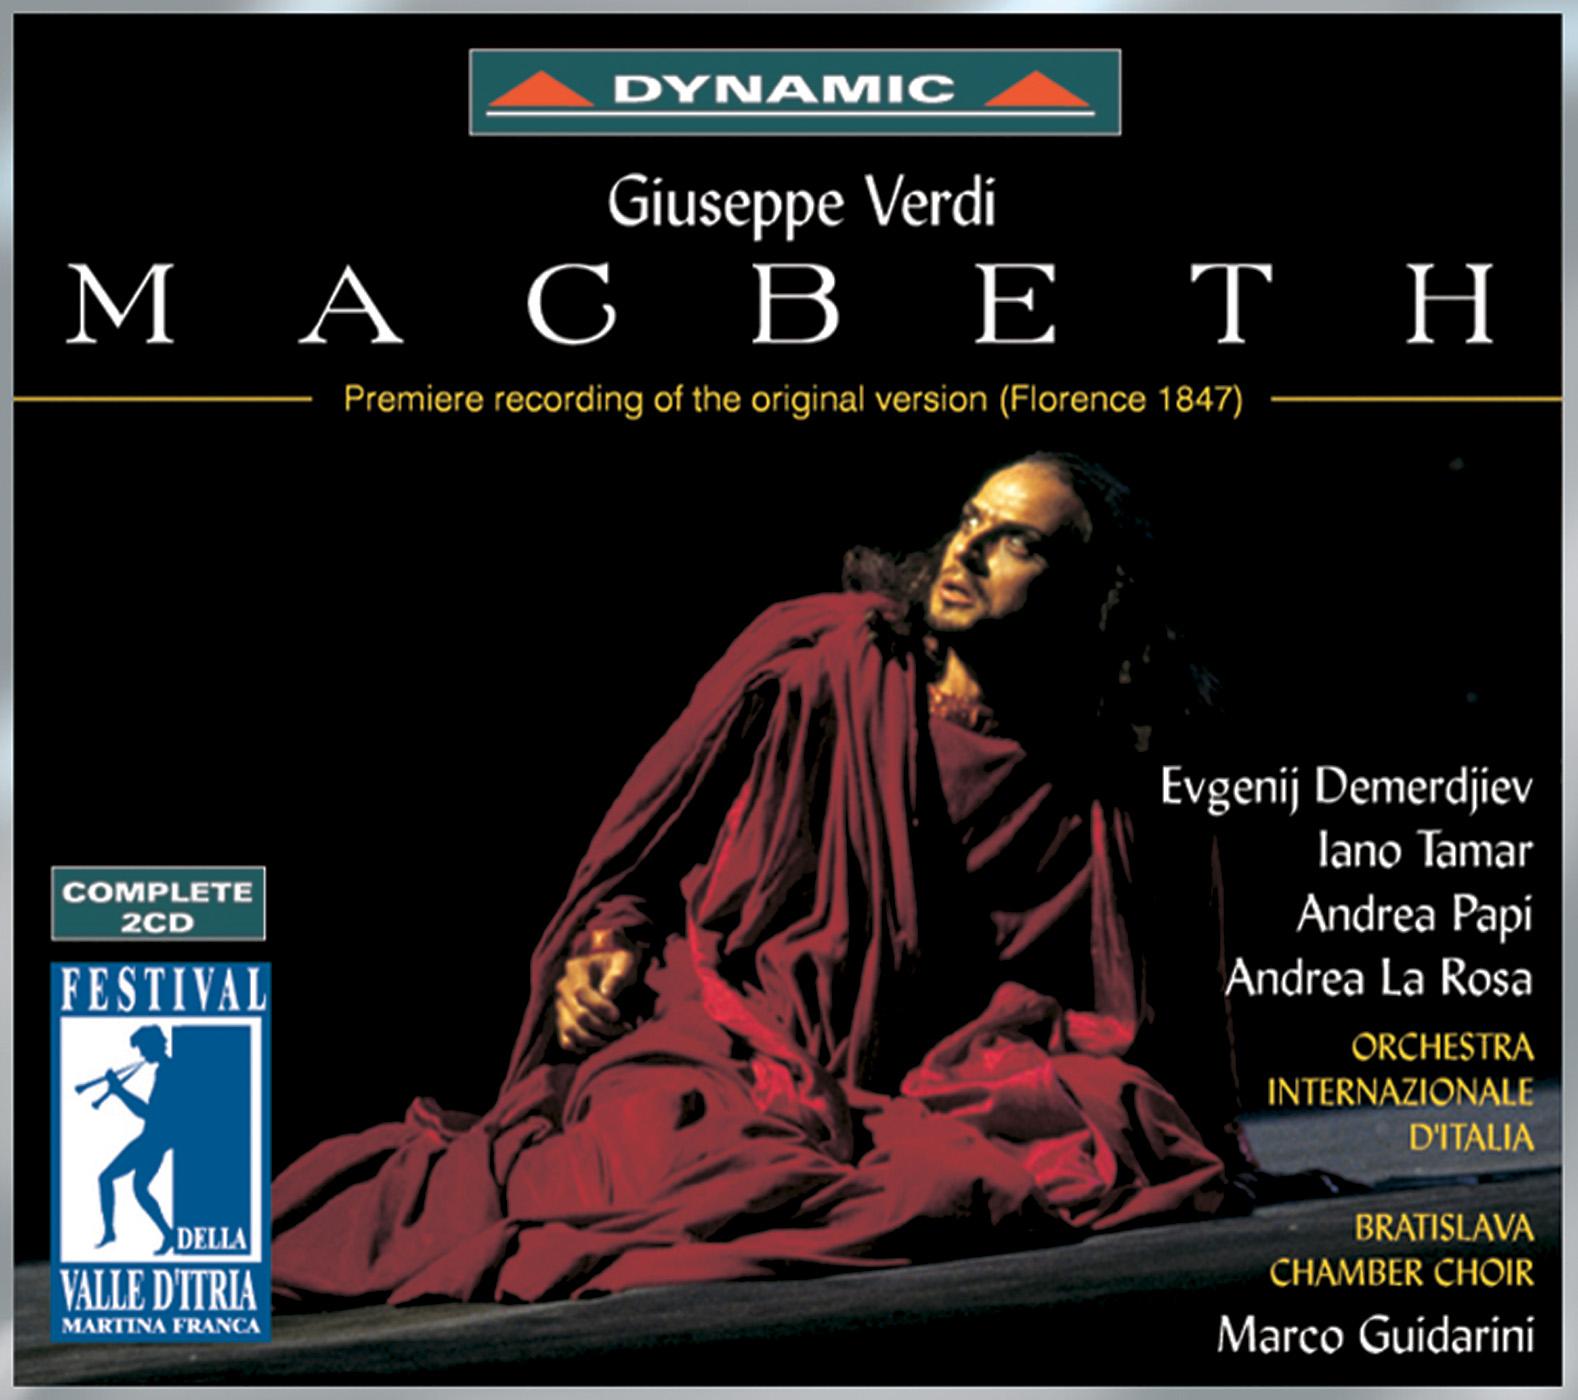 Verdi: Macbeth (Original Version, Florence 1847)